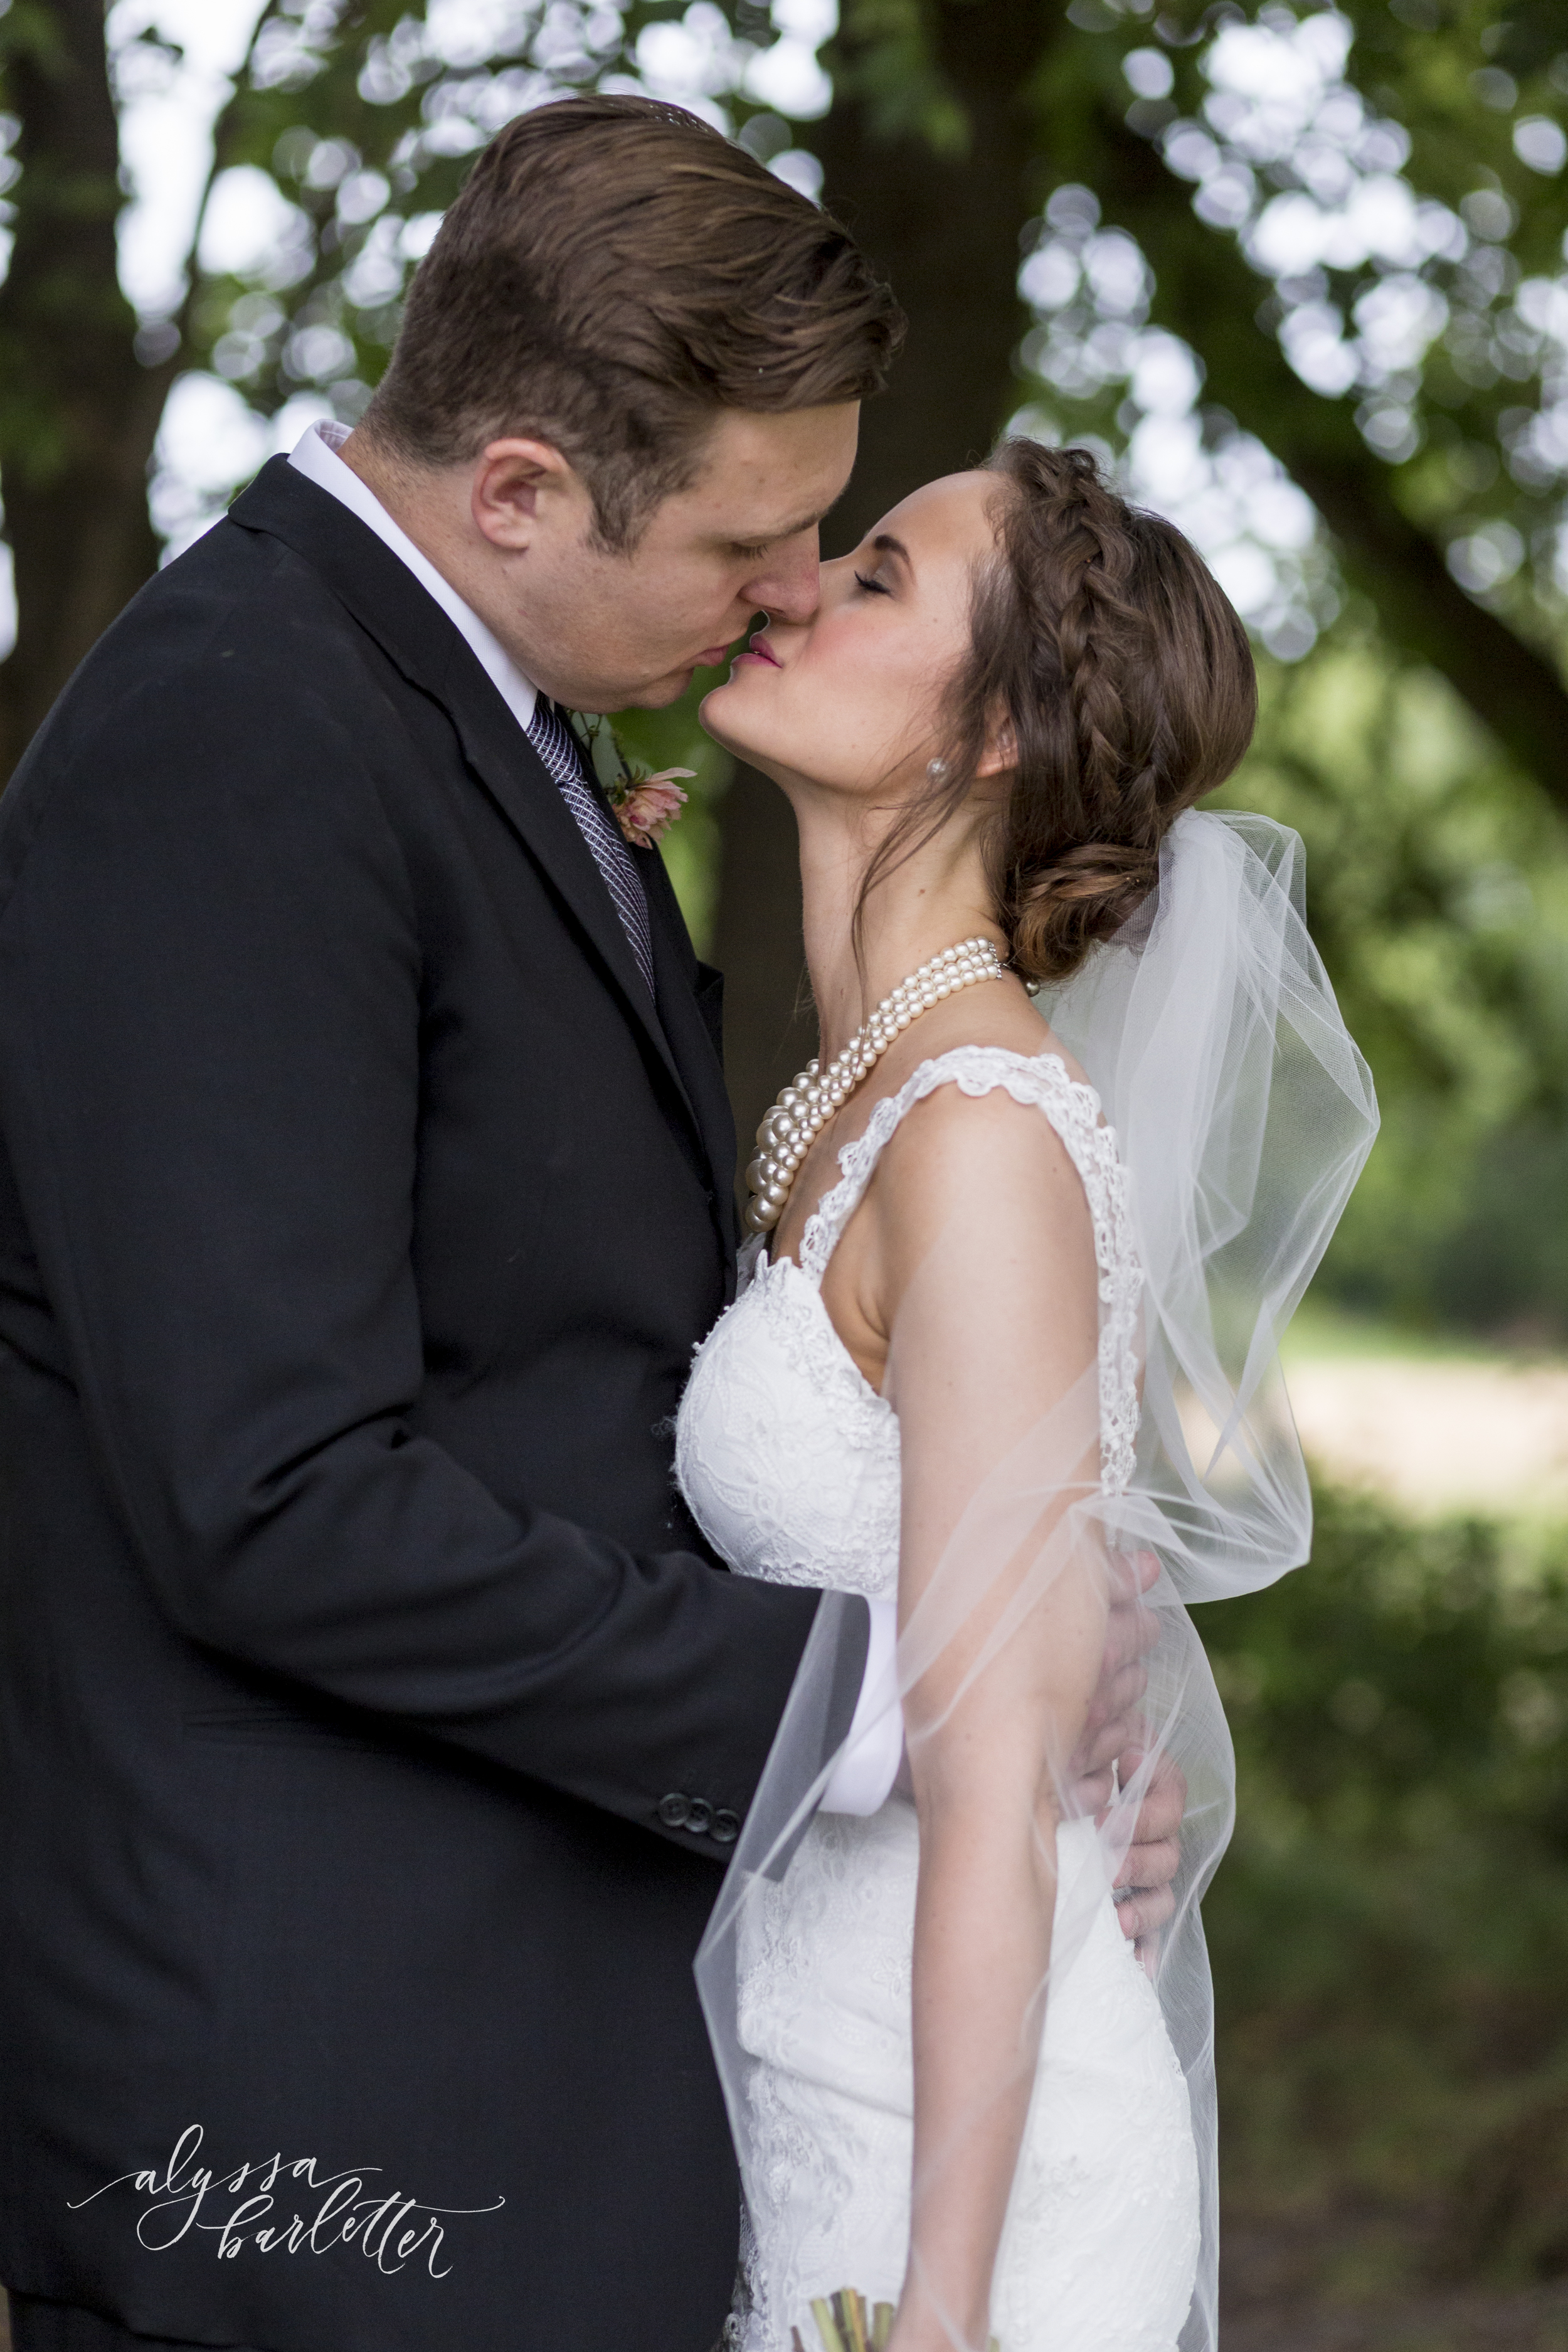 kansas city wedding budget mahaffie bride groom kiss portraits veil